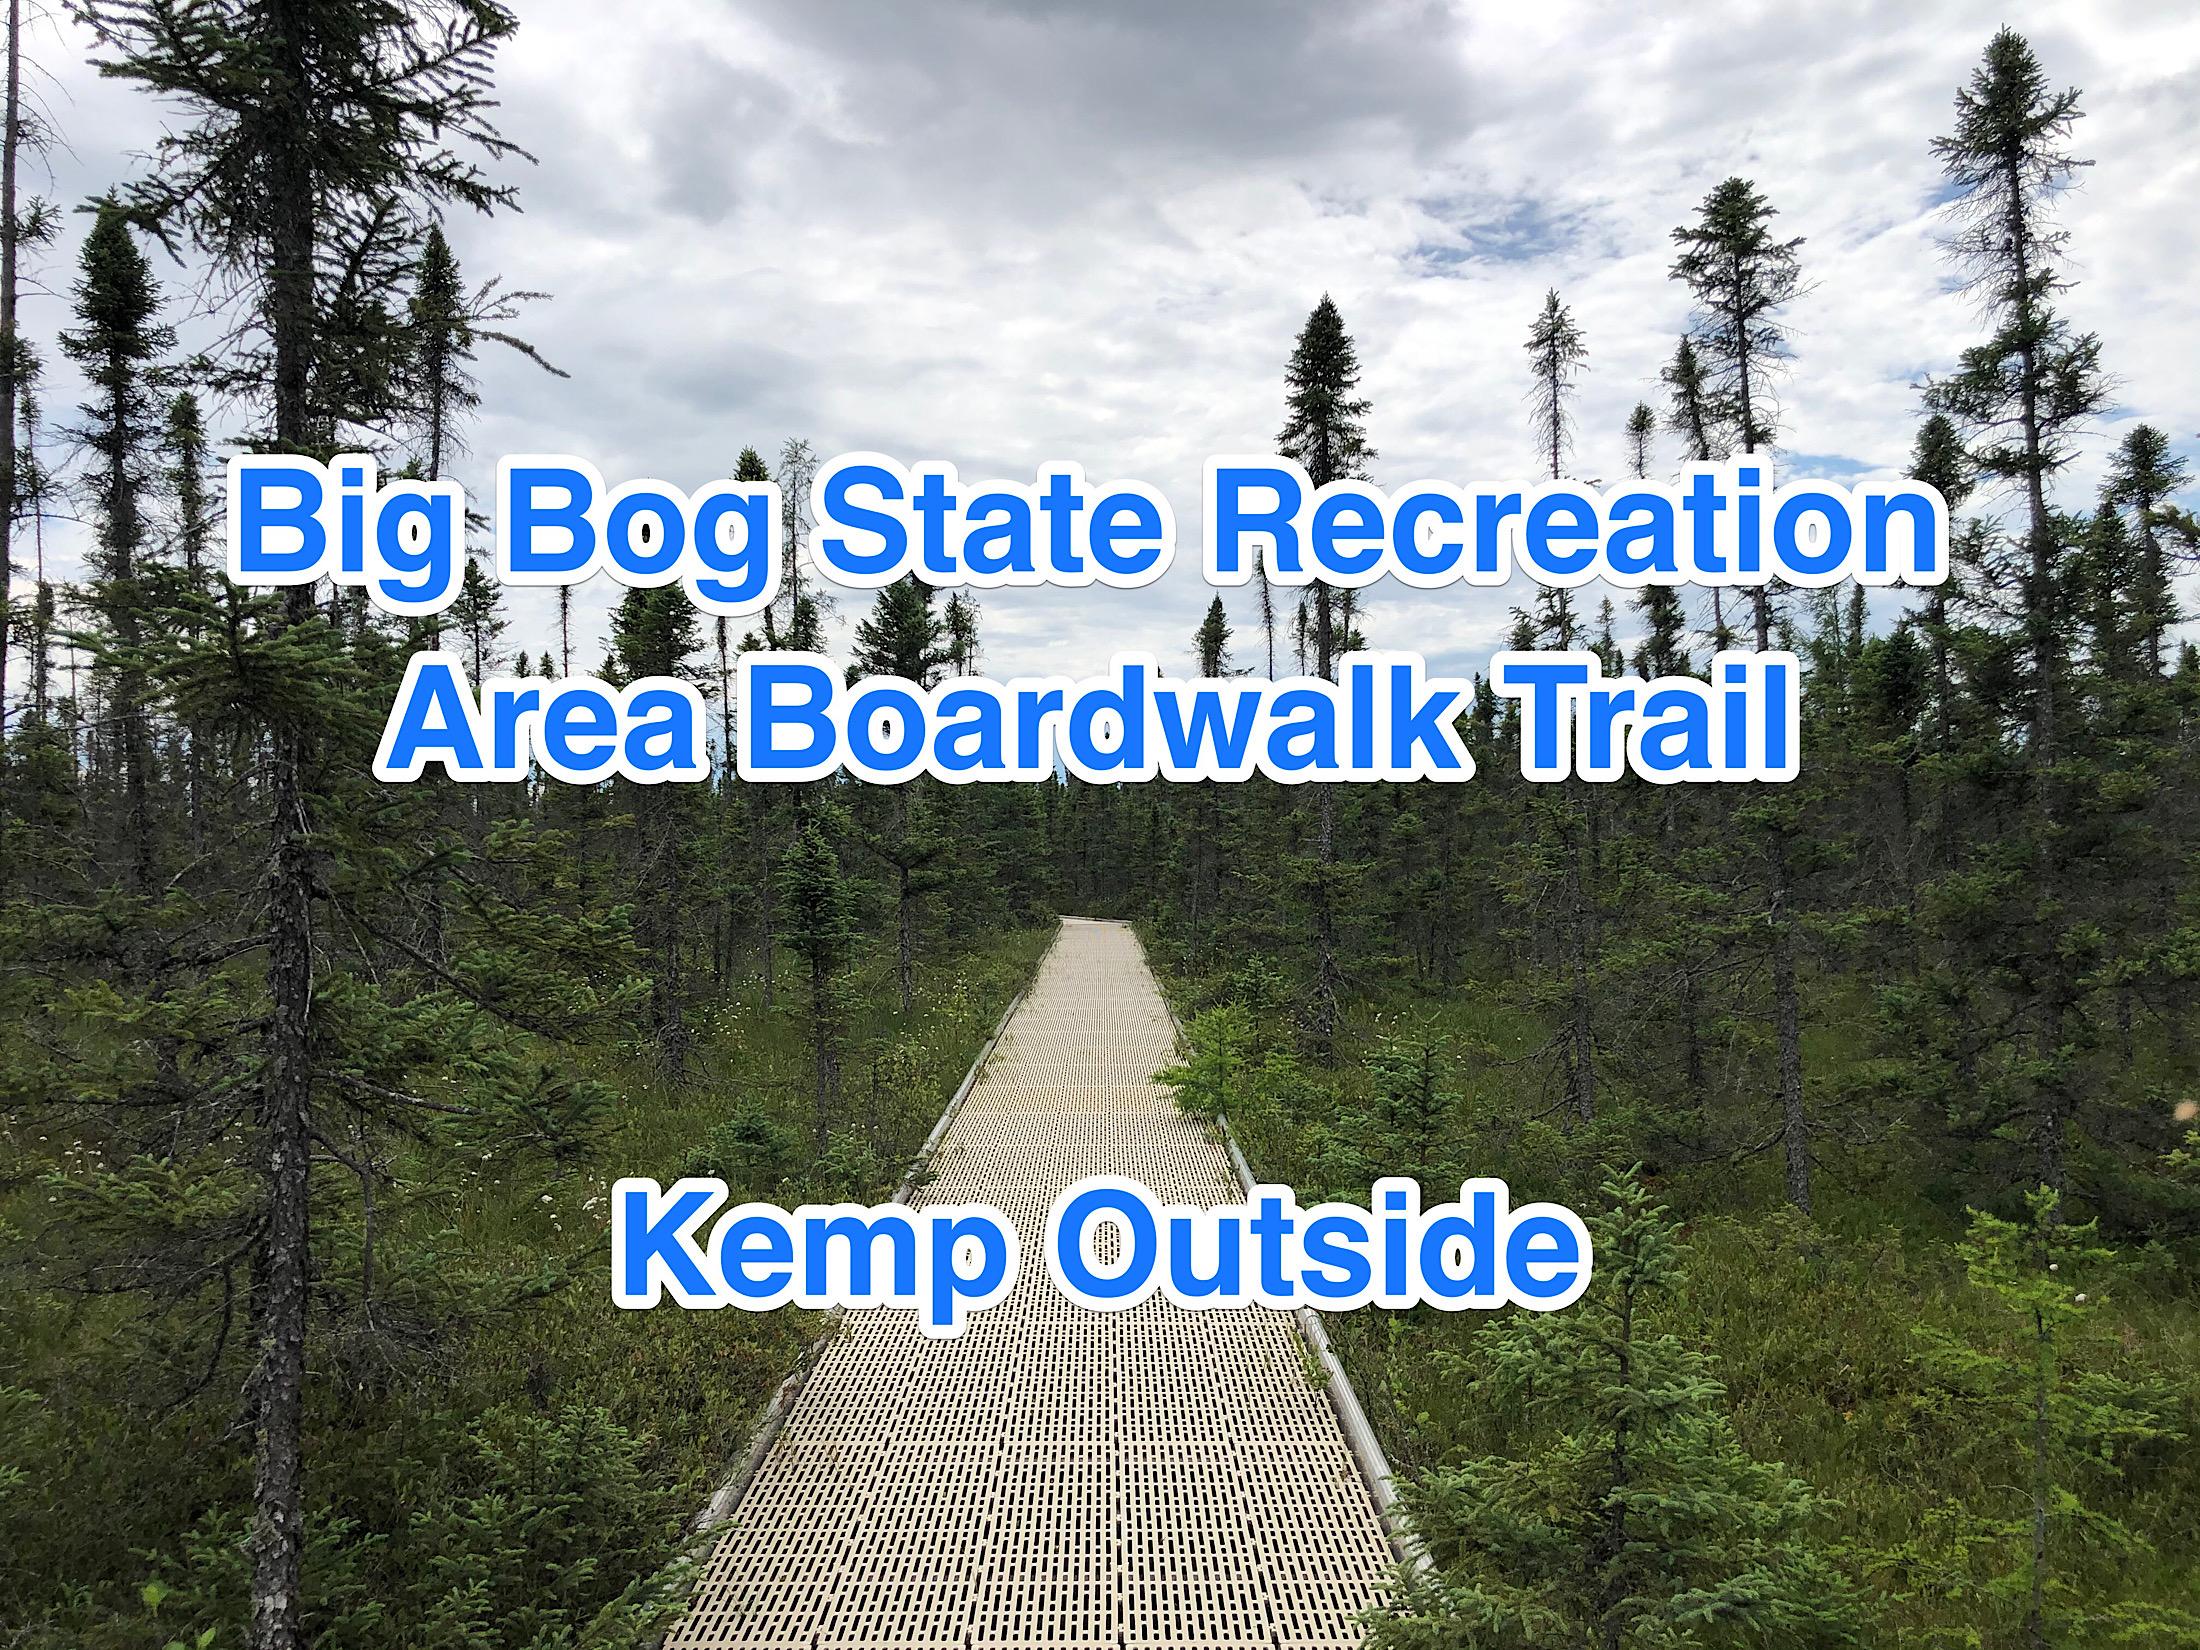 Hiking the Boardwalk Trail at Big Bog State Recreation Area Minnesota